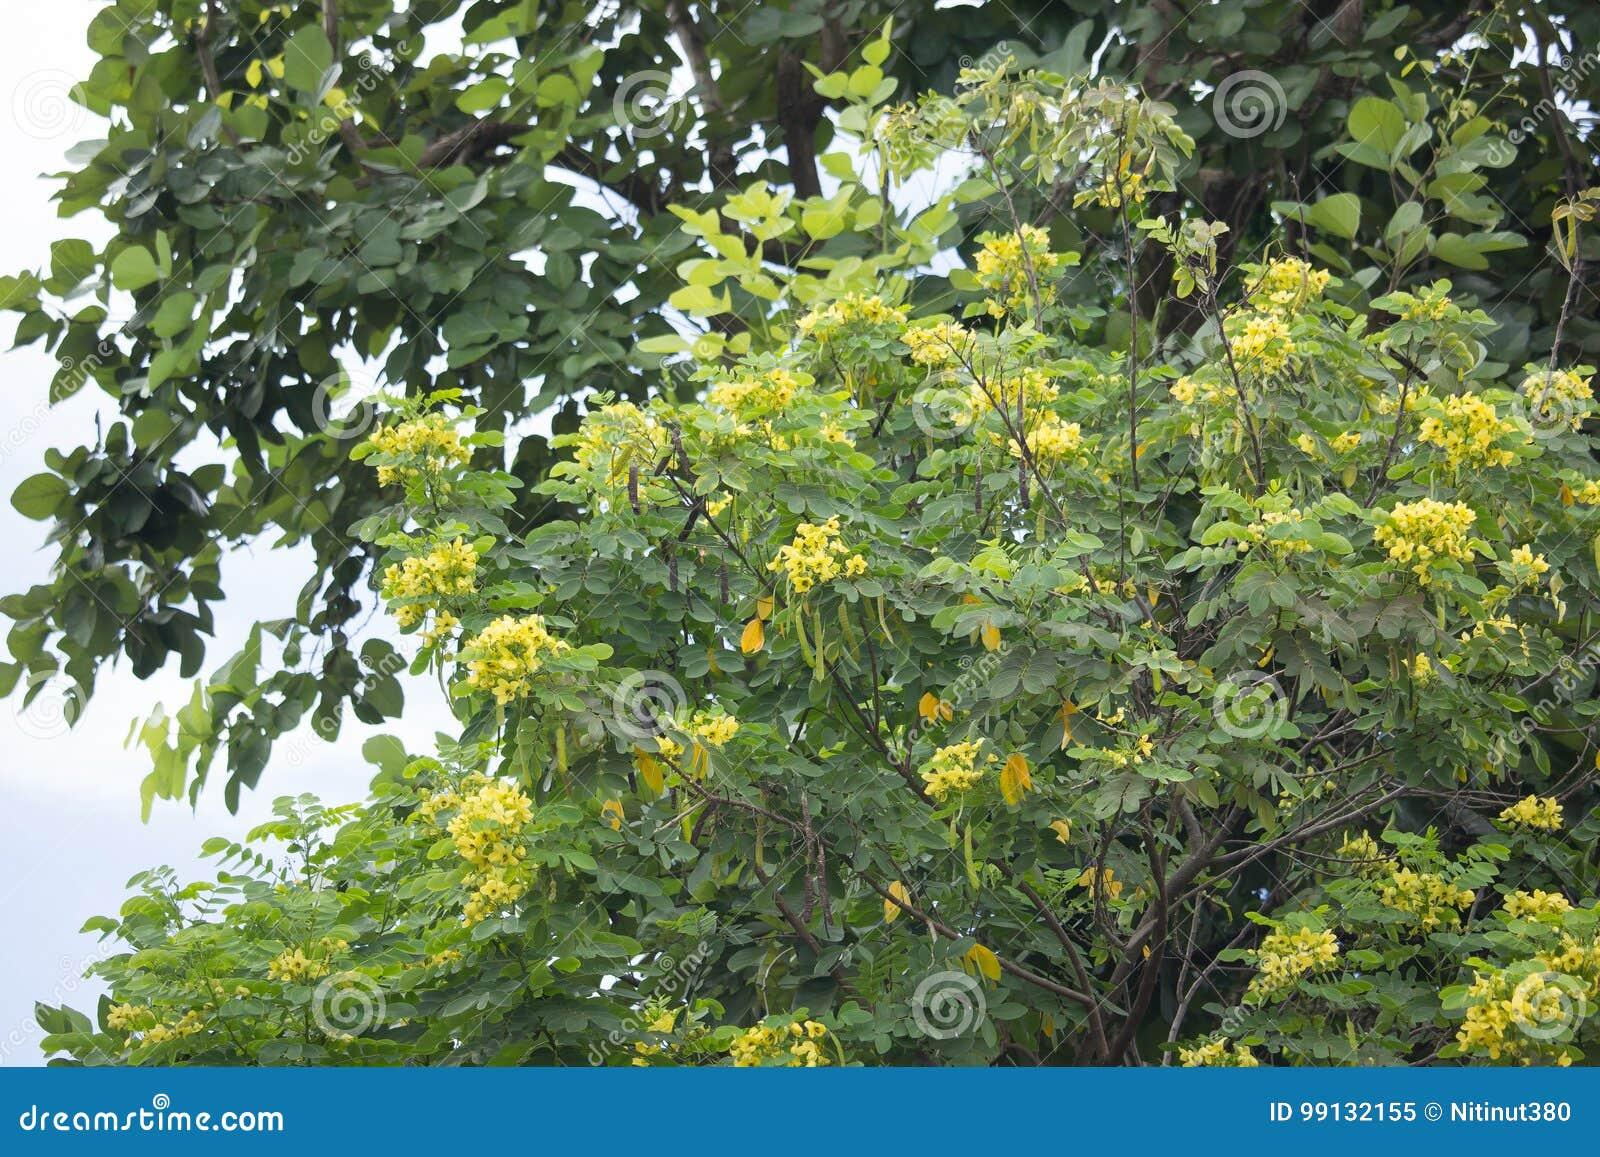 Yellow flower of thai copper pod or cassod tree stock image image download yellow flower of thai copper pod or cassod tree stock image image of copper mightylinksfo